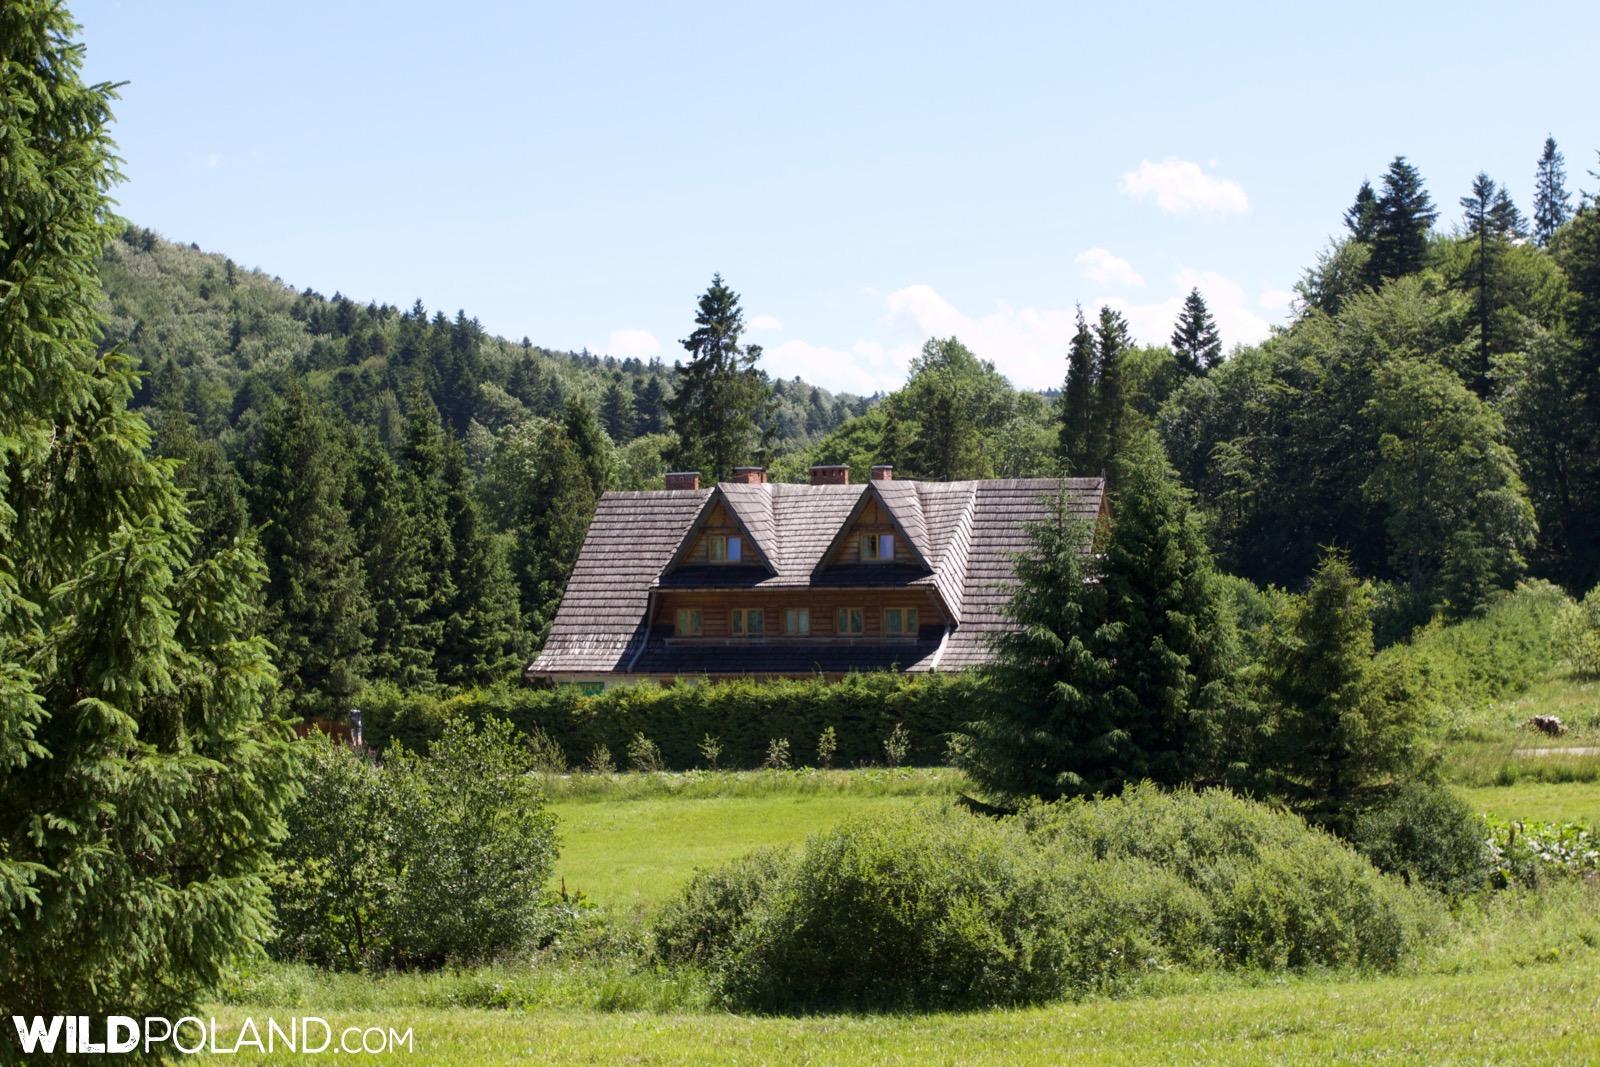 Arnika gueshouse in Bieszczady Mountains, photo by Lukasz Mazurek